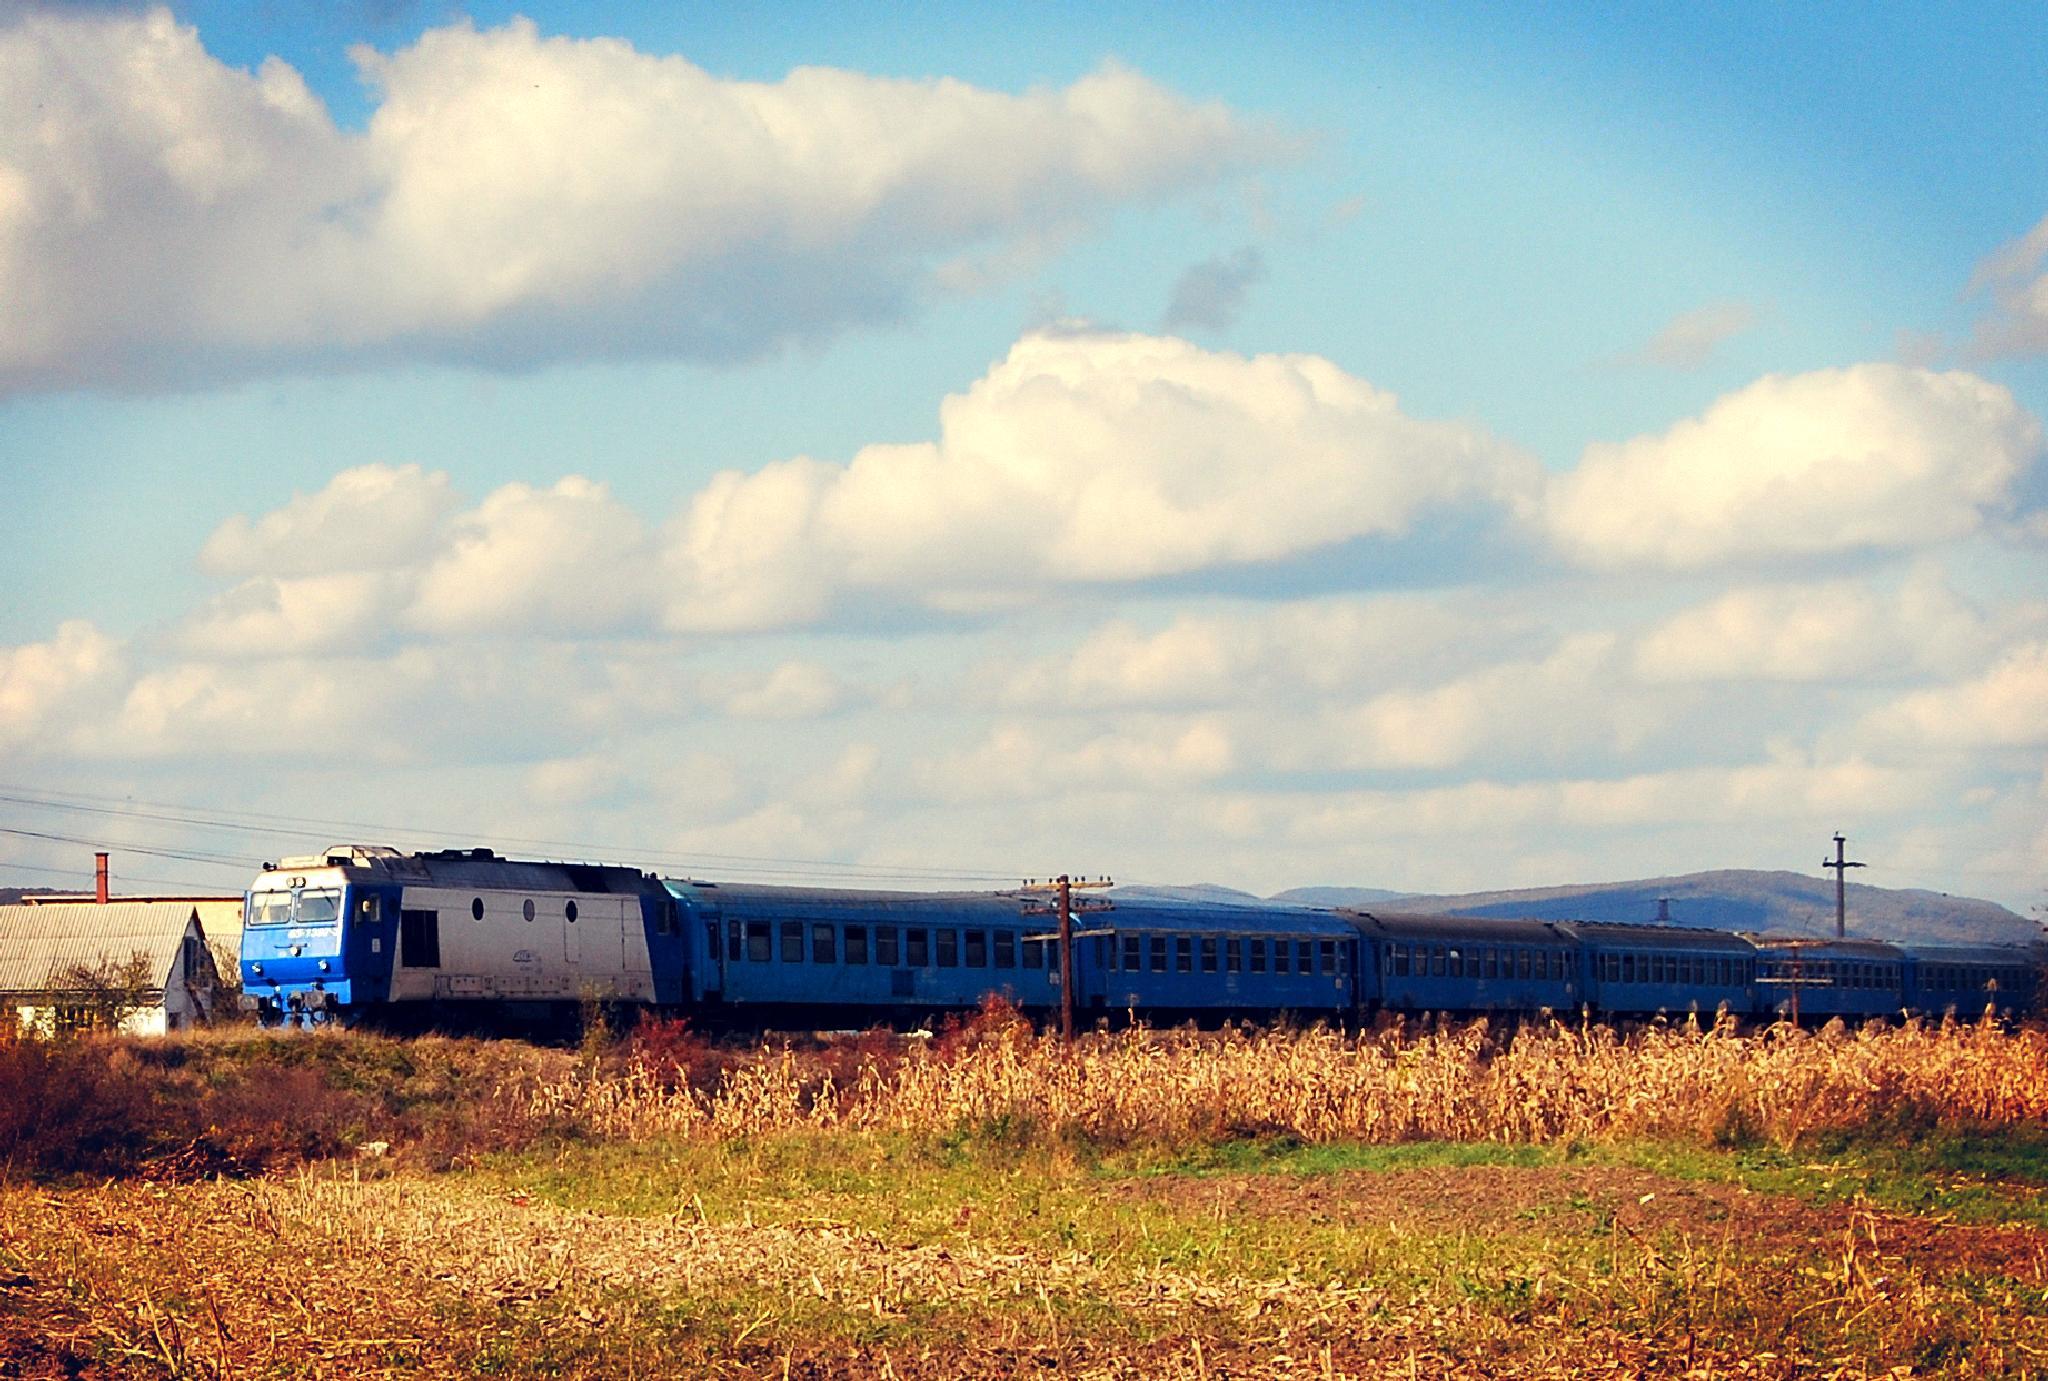 Train of Thought by Anda Cadariu